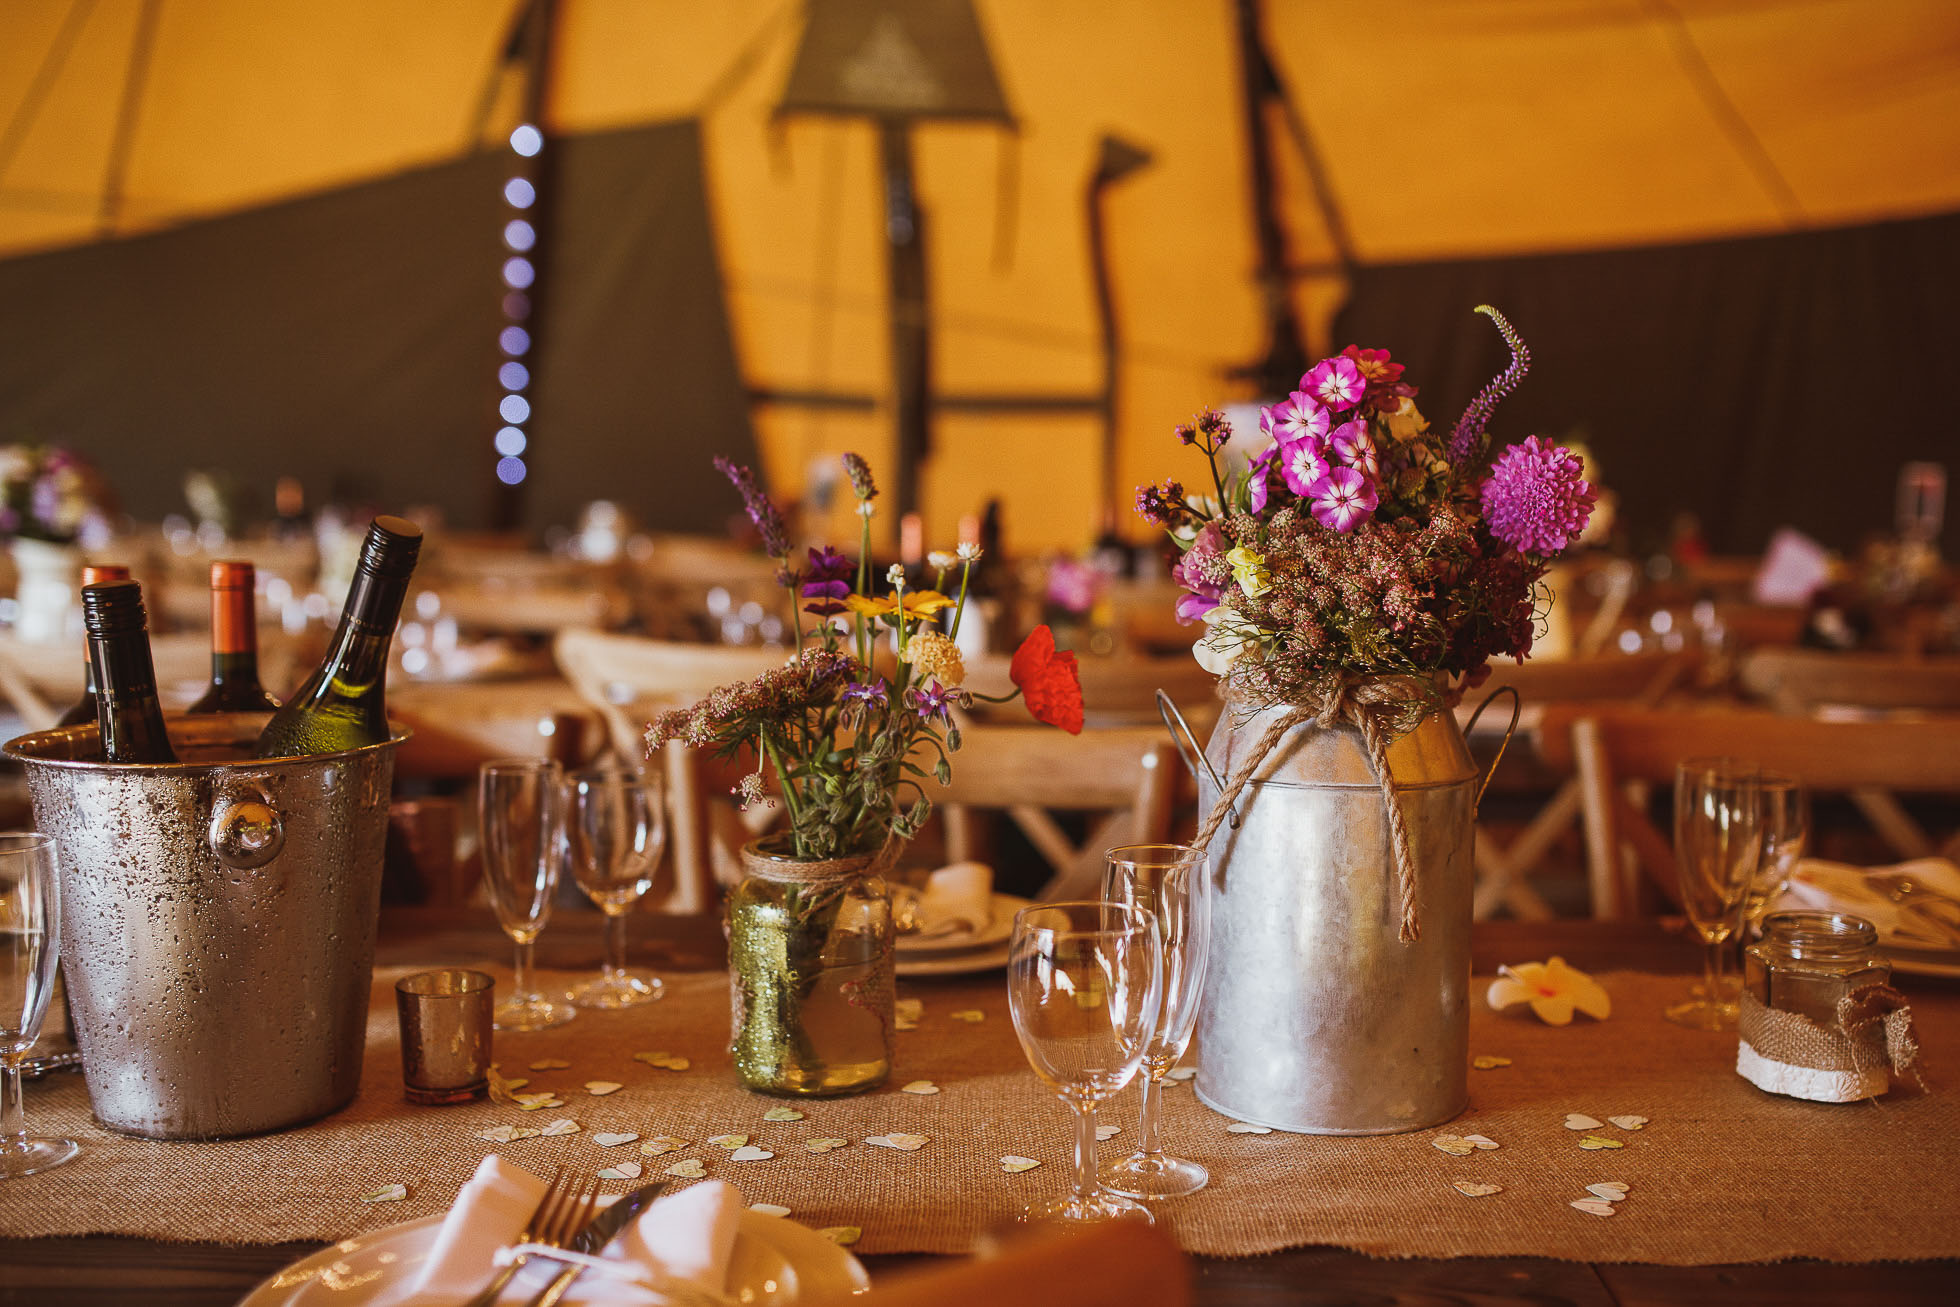 skipbridge_farm_wedding_york-82.jpg